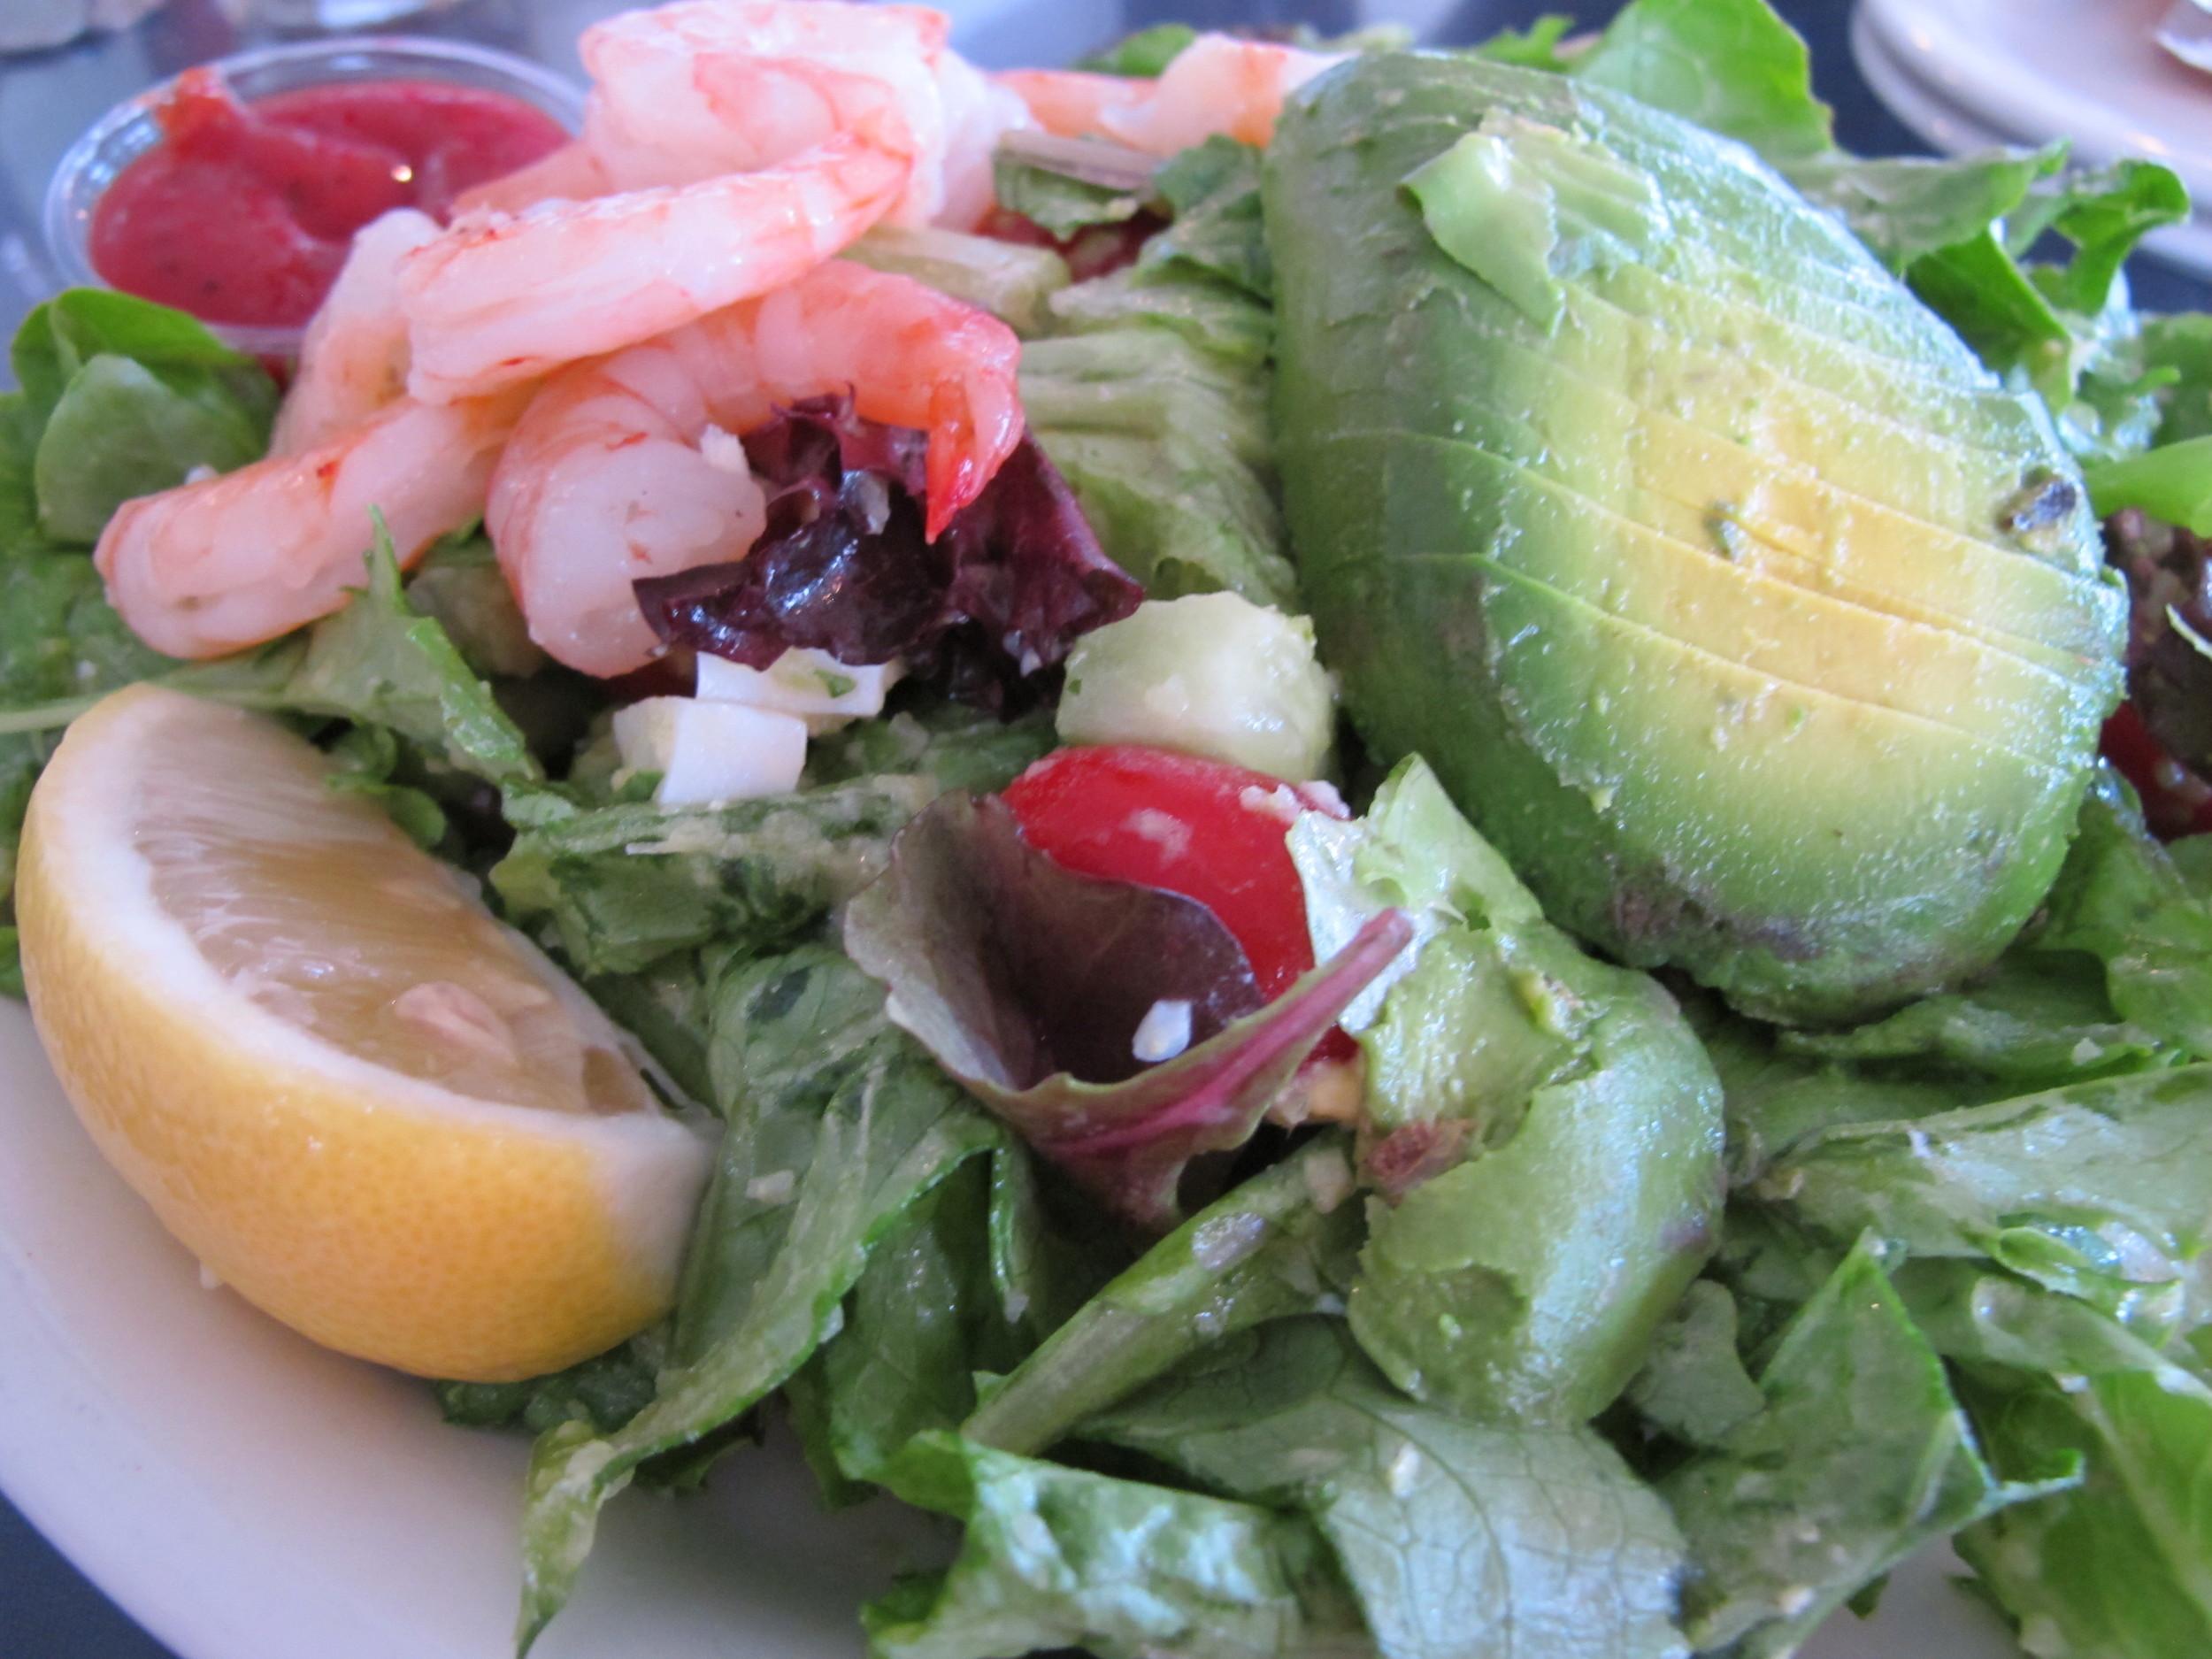 Brophy's Shrimp and Avocado Salad